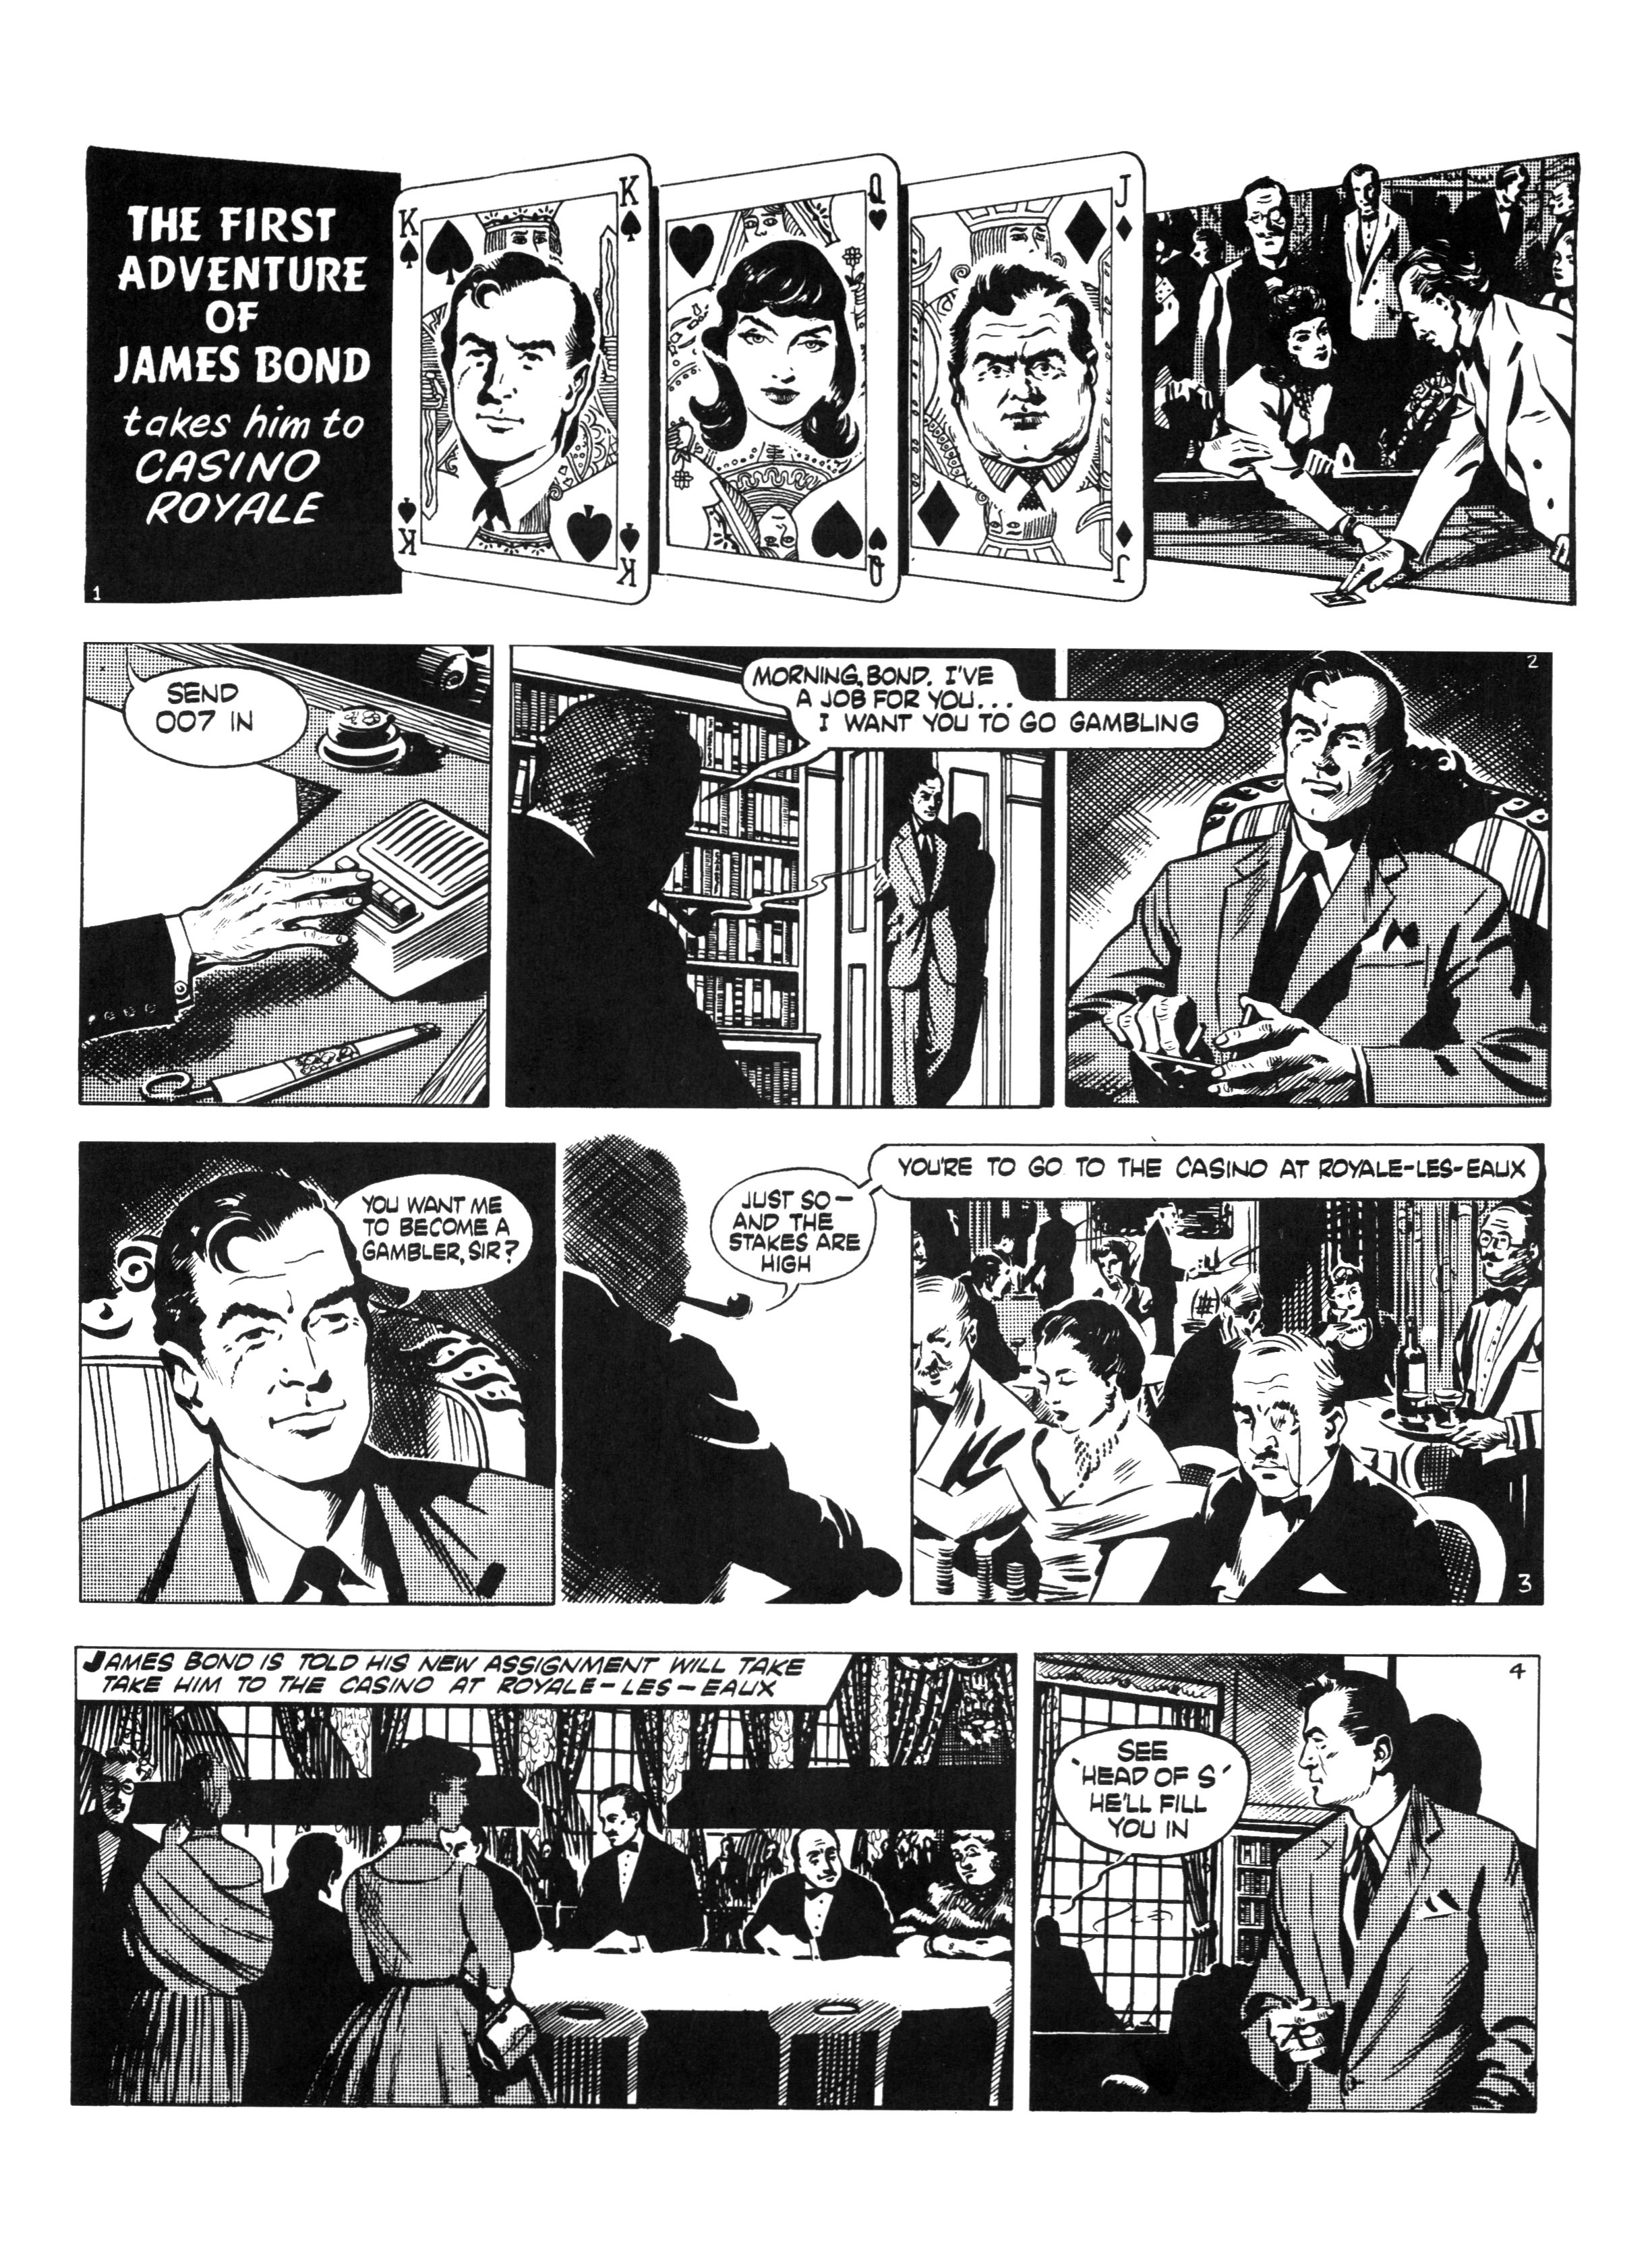 Les premier strips de Casino Royale selon Anthony Hern et John McLusky (juillet 1958)